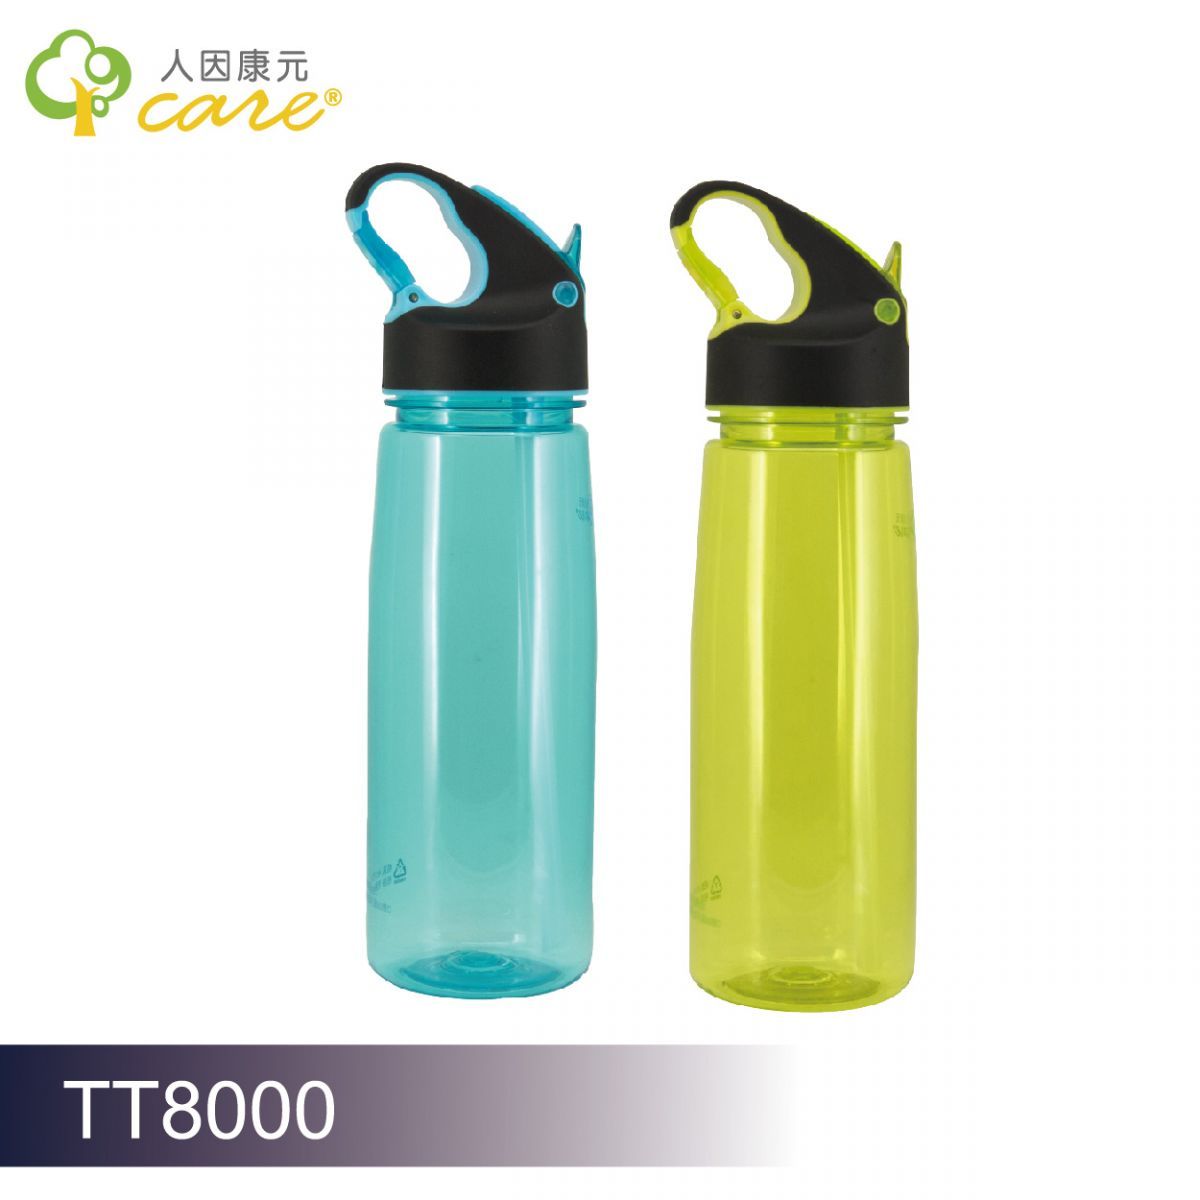 【ErgoCare】新負離子能量運動水壺 TT8000B 閃電藍 800ml